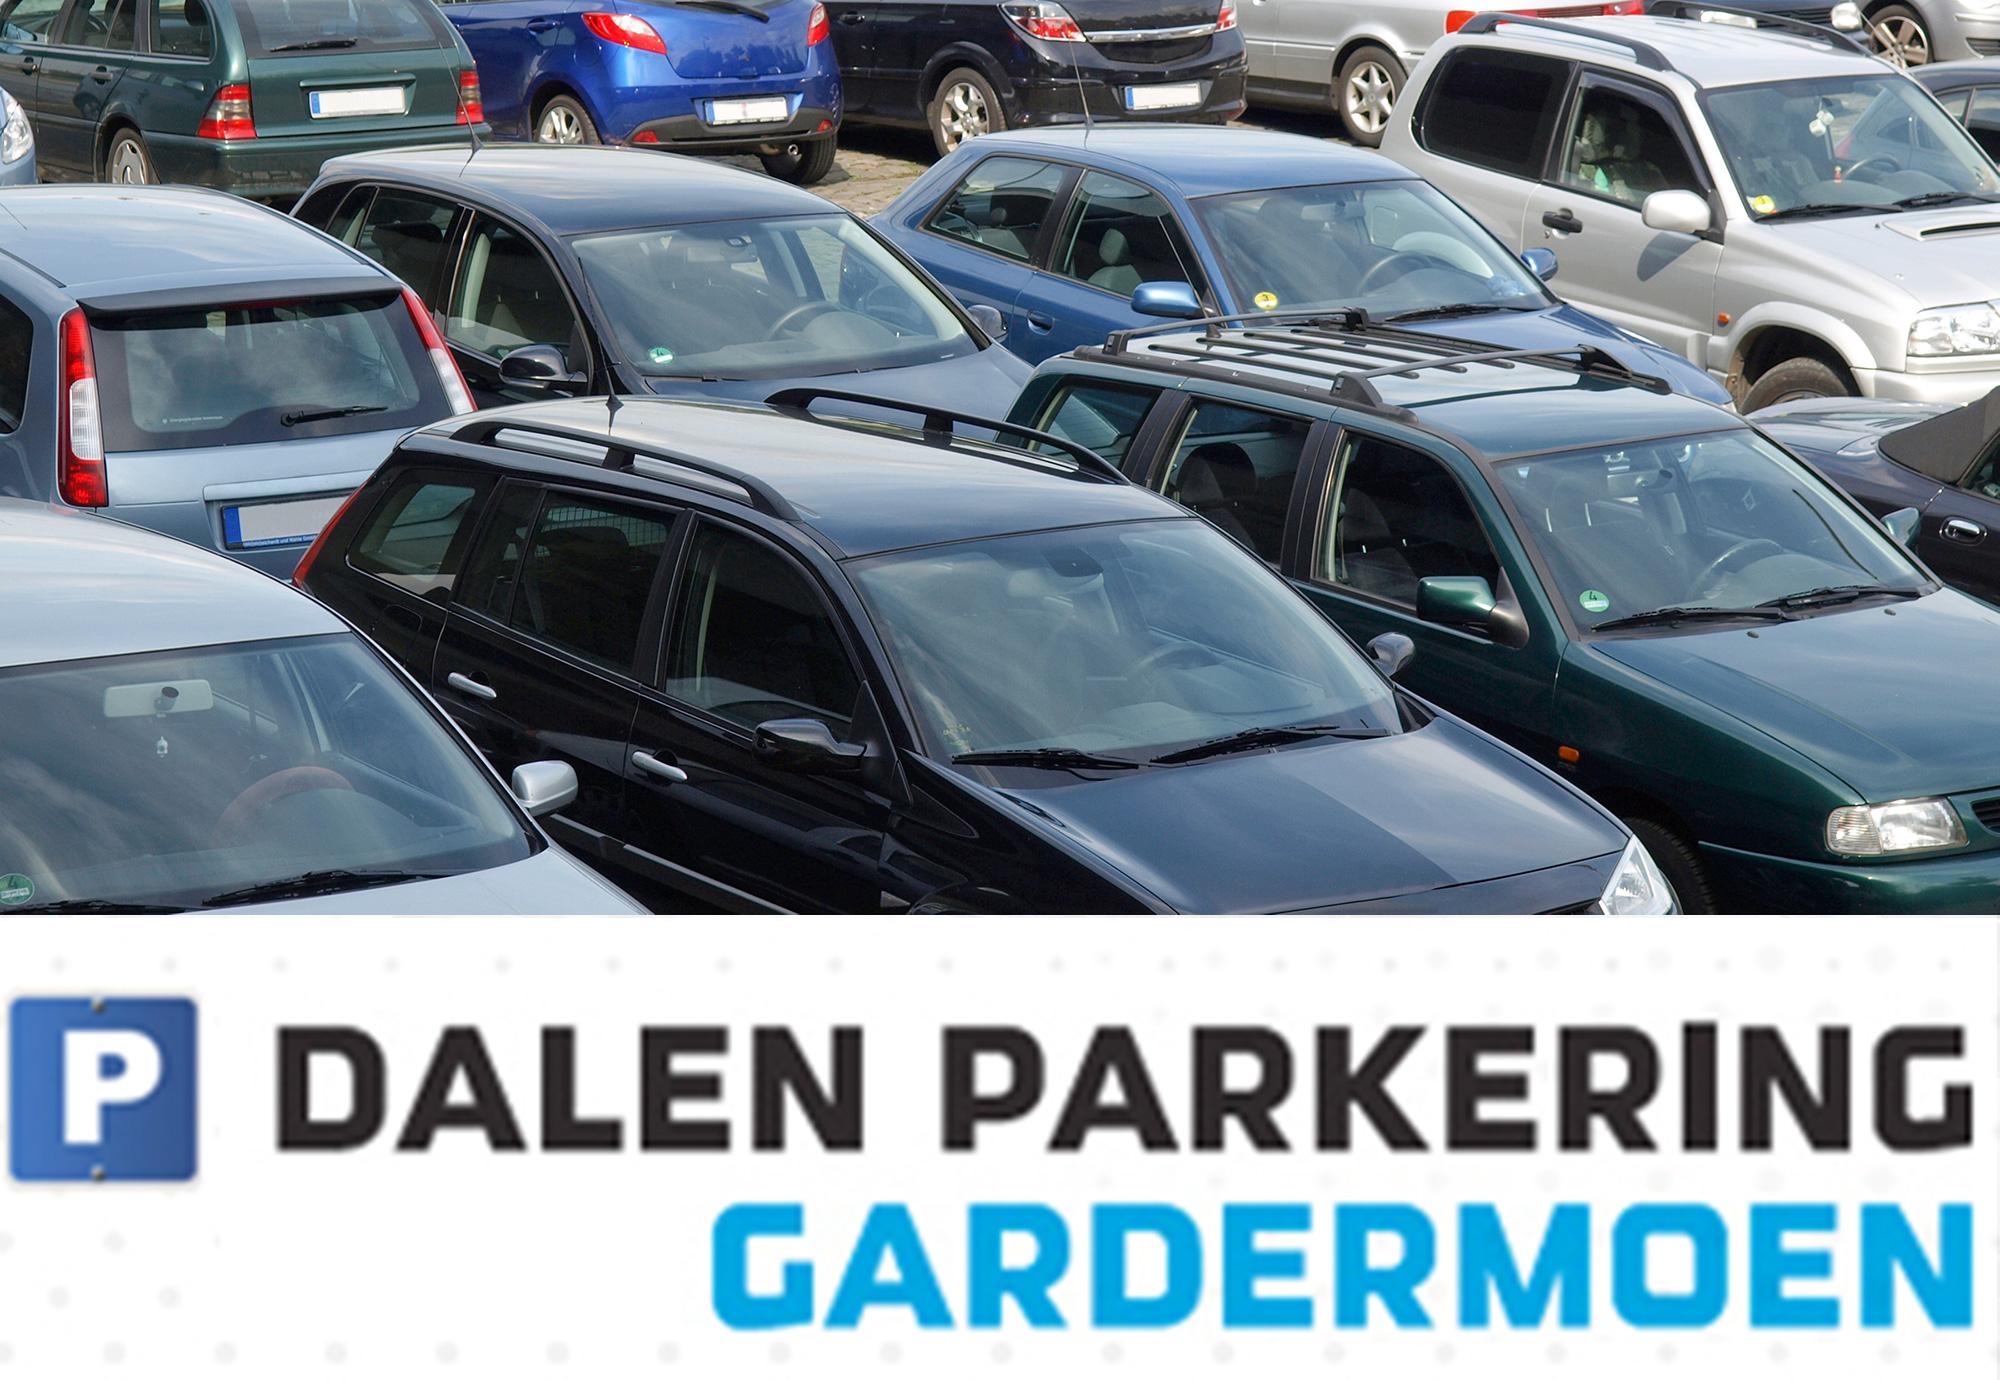 Dalen Parkering, Gardermoen